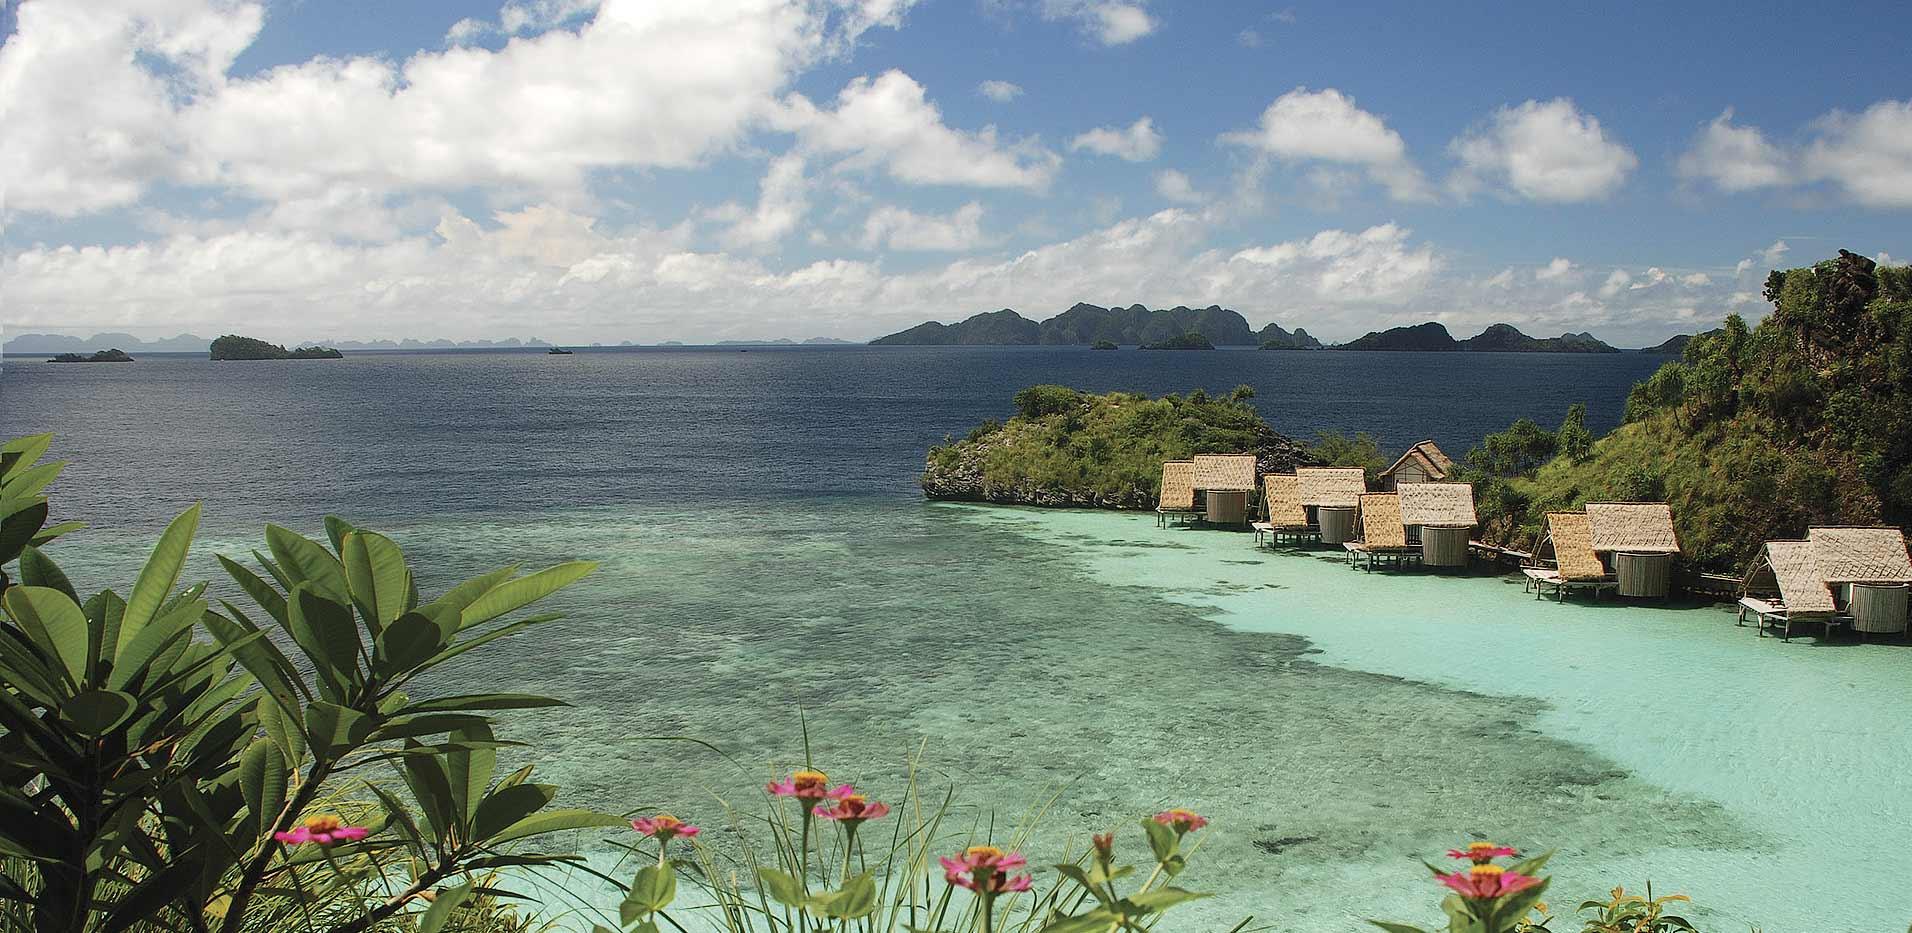 Misool Eco Resort in Raja Ampat, Indonesia | Private islands